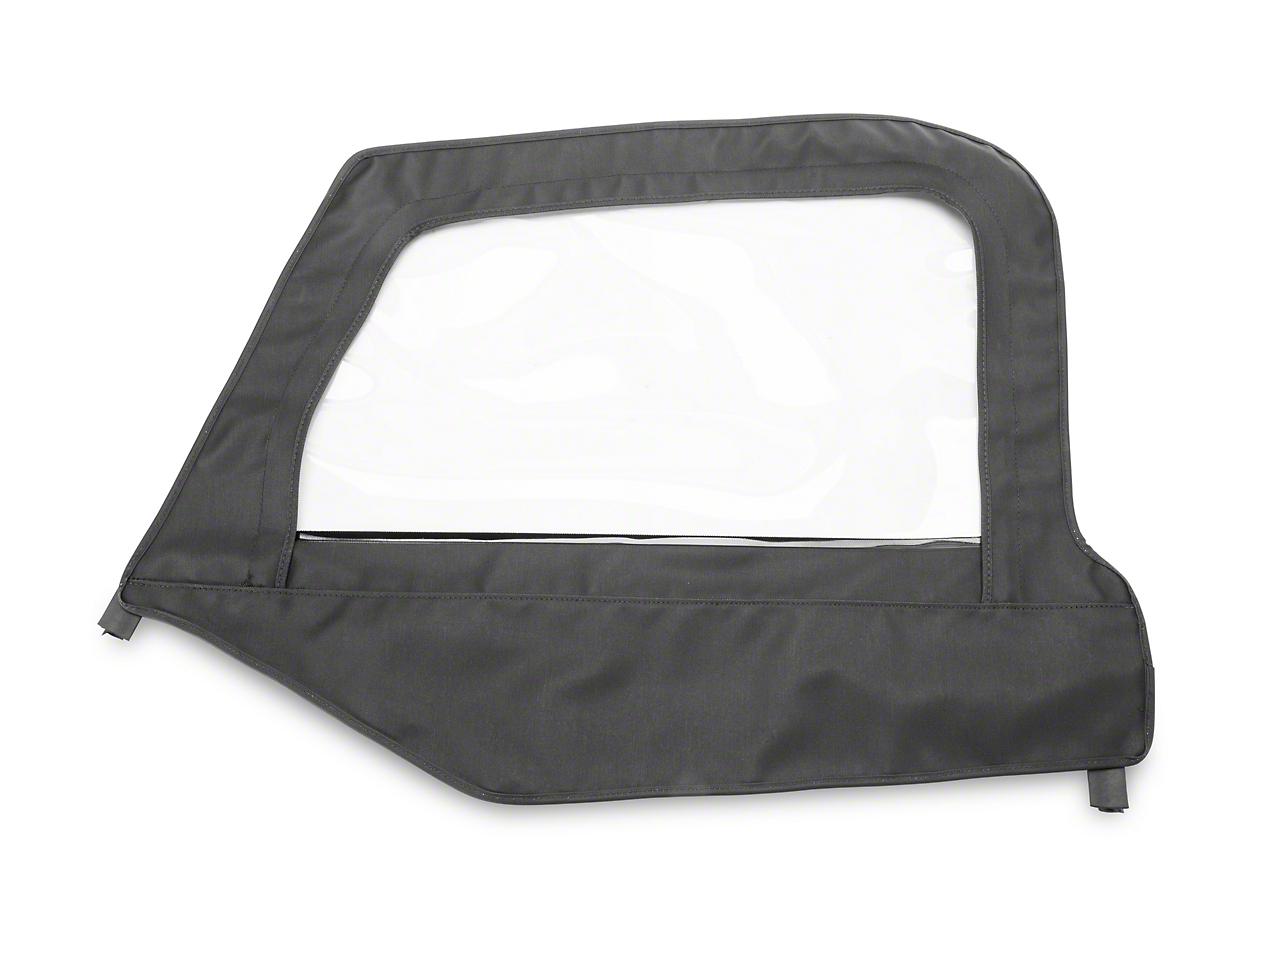 MasterTop Replacement Door Skin - Black Diamond - Driver Side (97-06 Jeep Wrangler TJ)